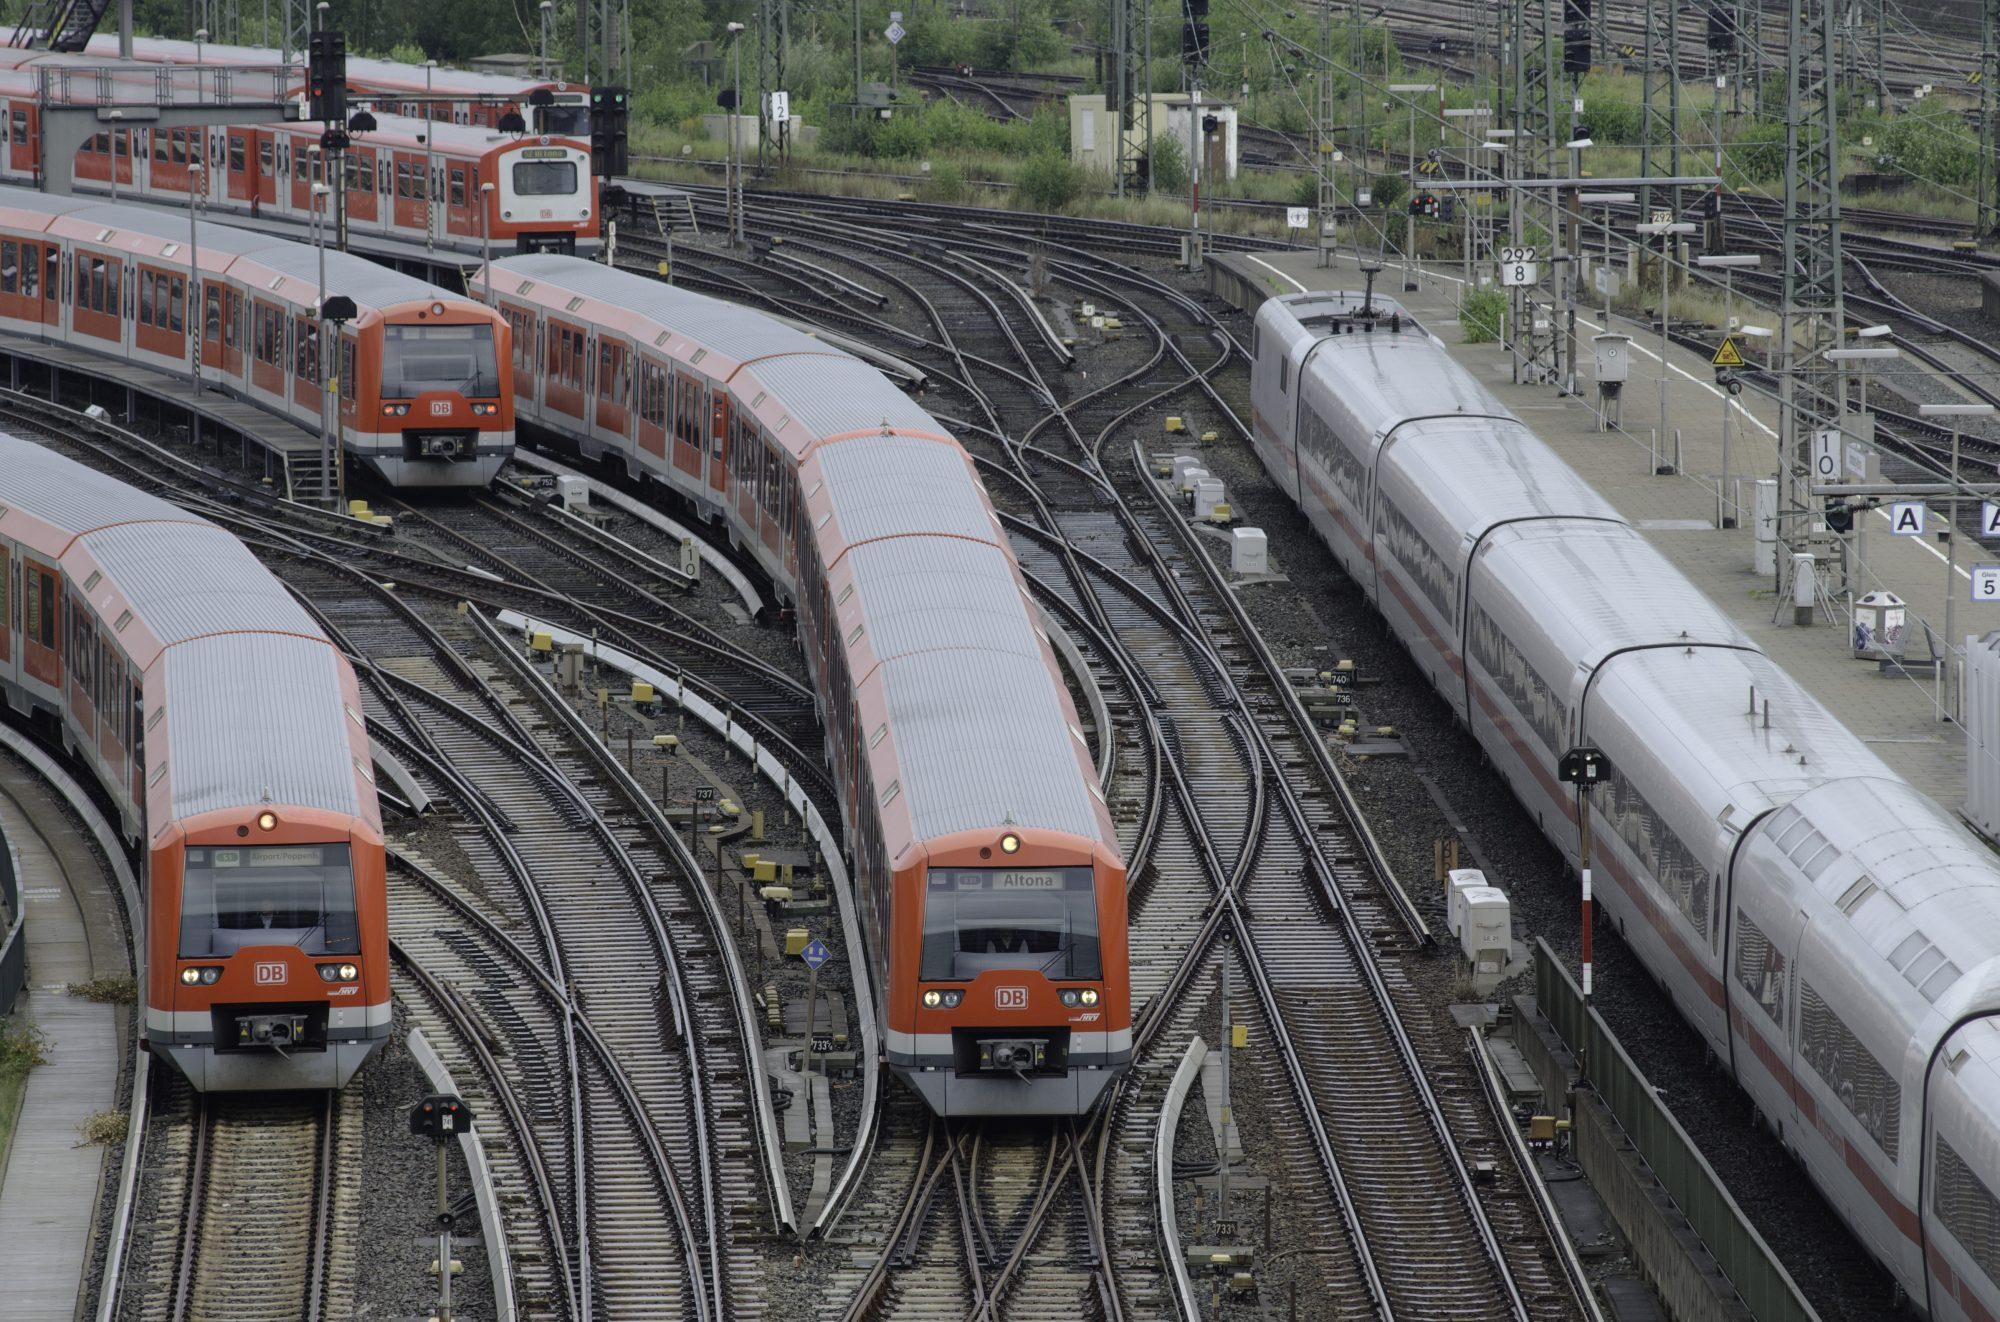 Hamburg S Bahn Looks To Driverless Future Global Rail News